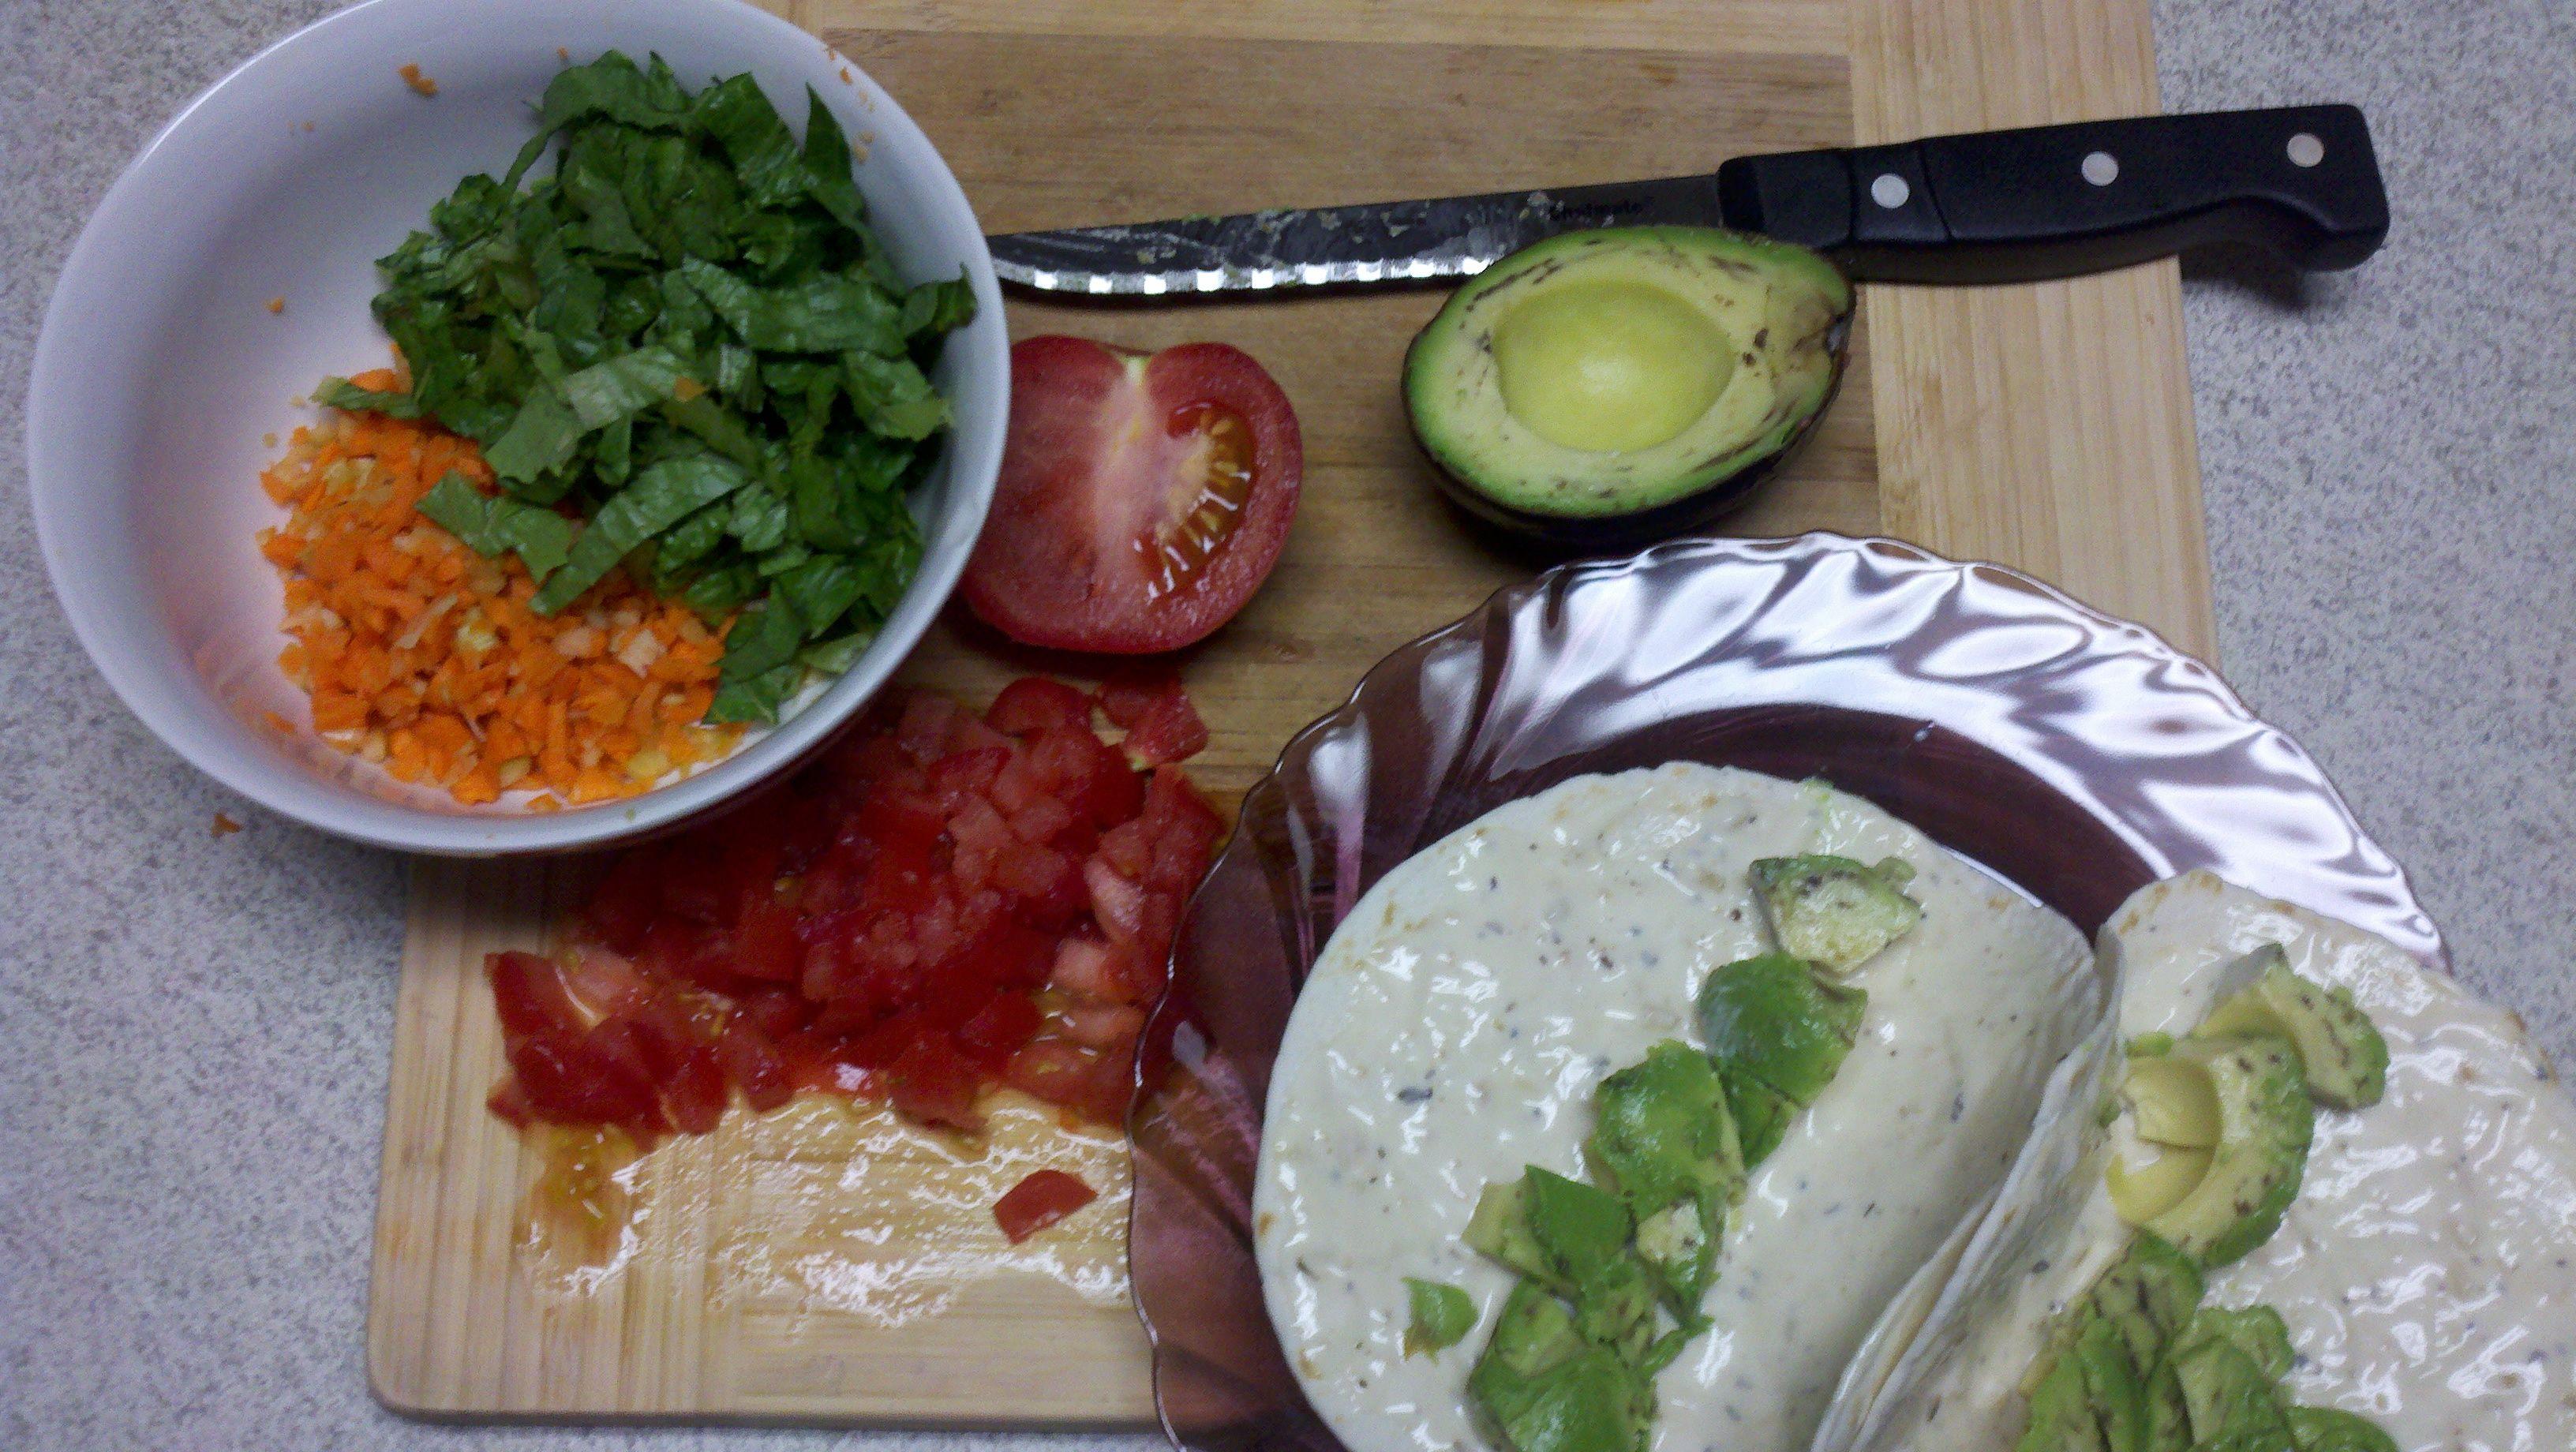 prepping vege wraps mmmm